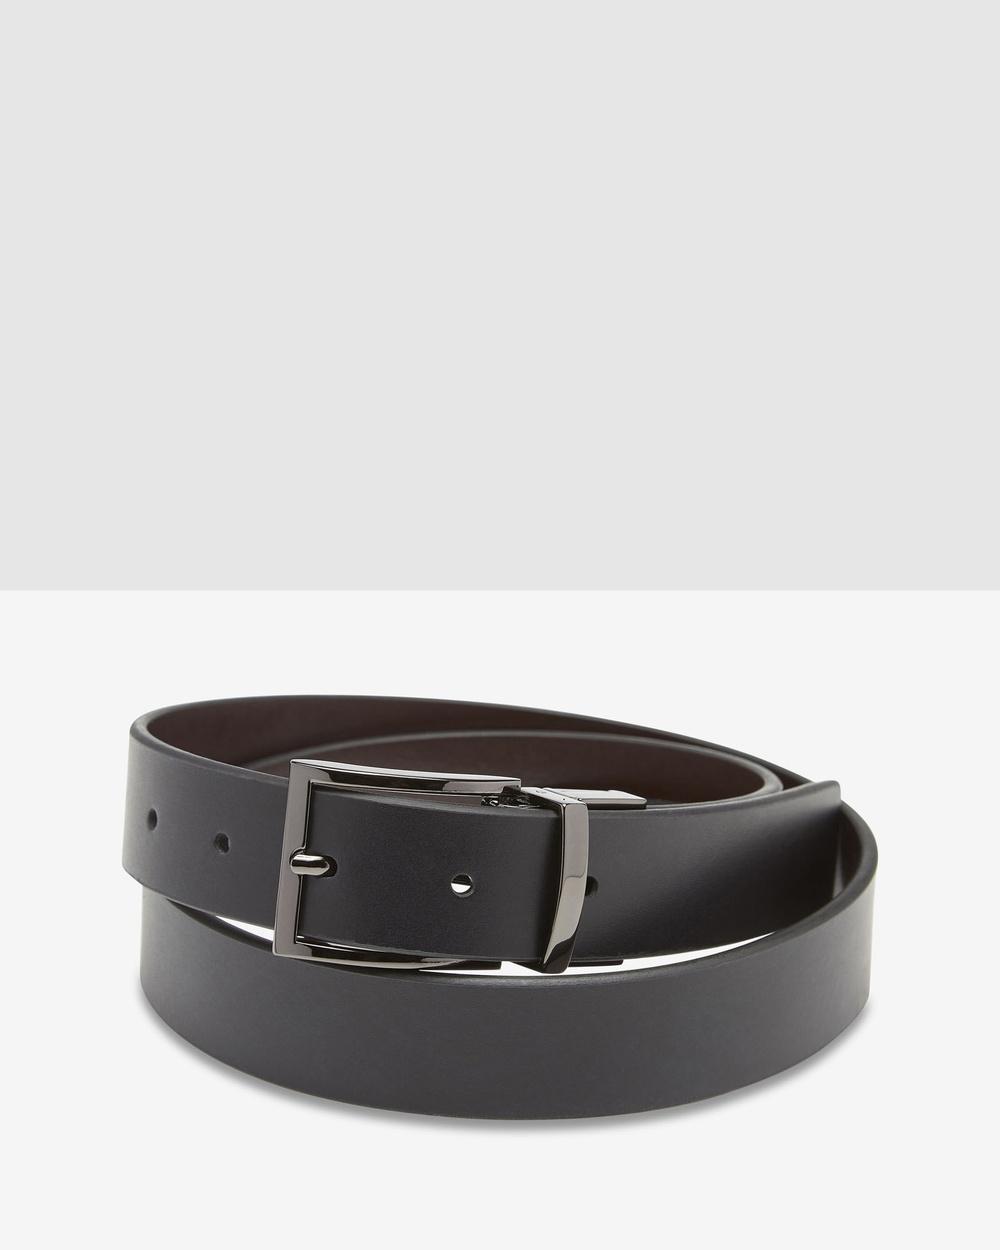 Oxford Carson Leather Reversible Belt Belts Black/Brown